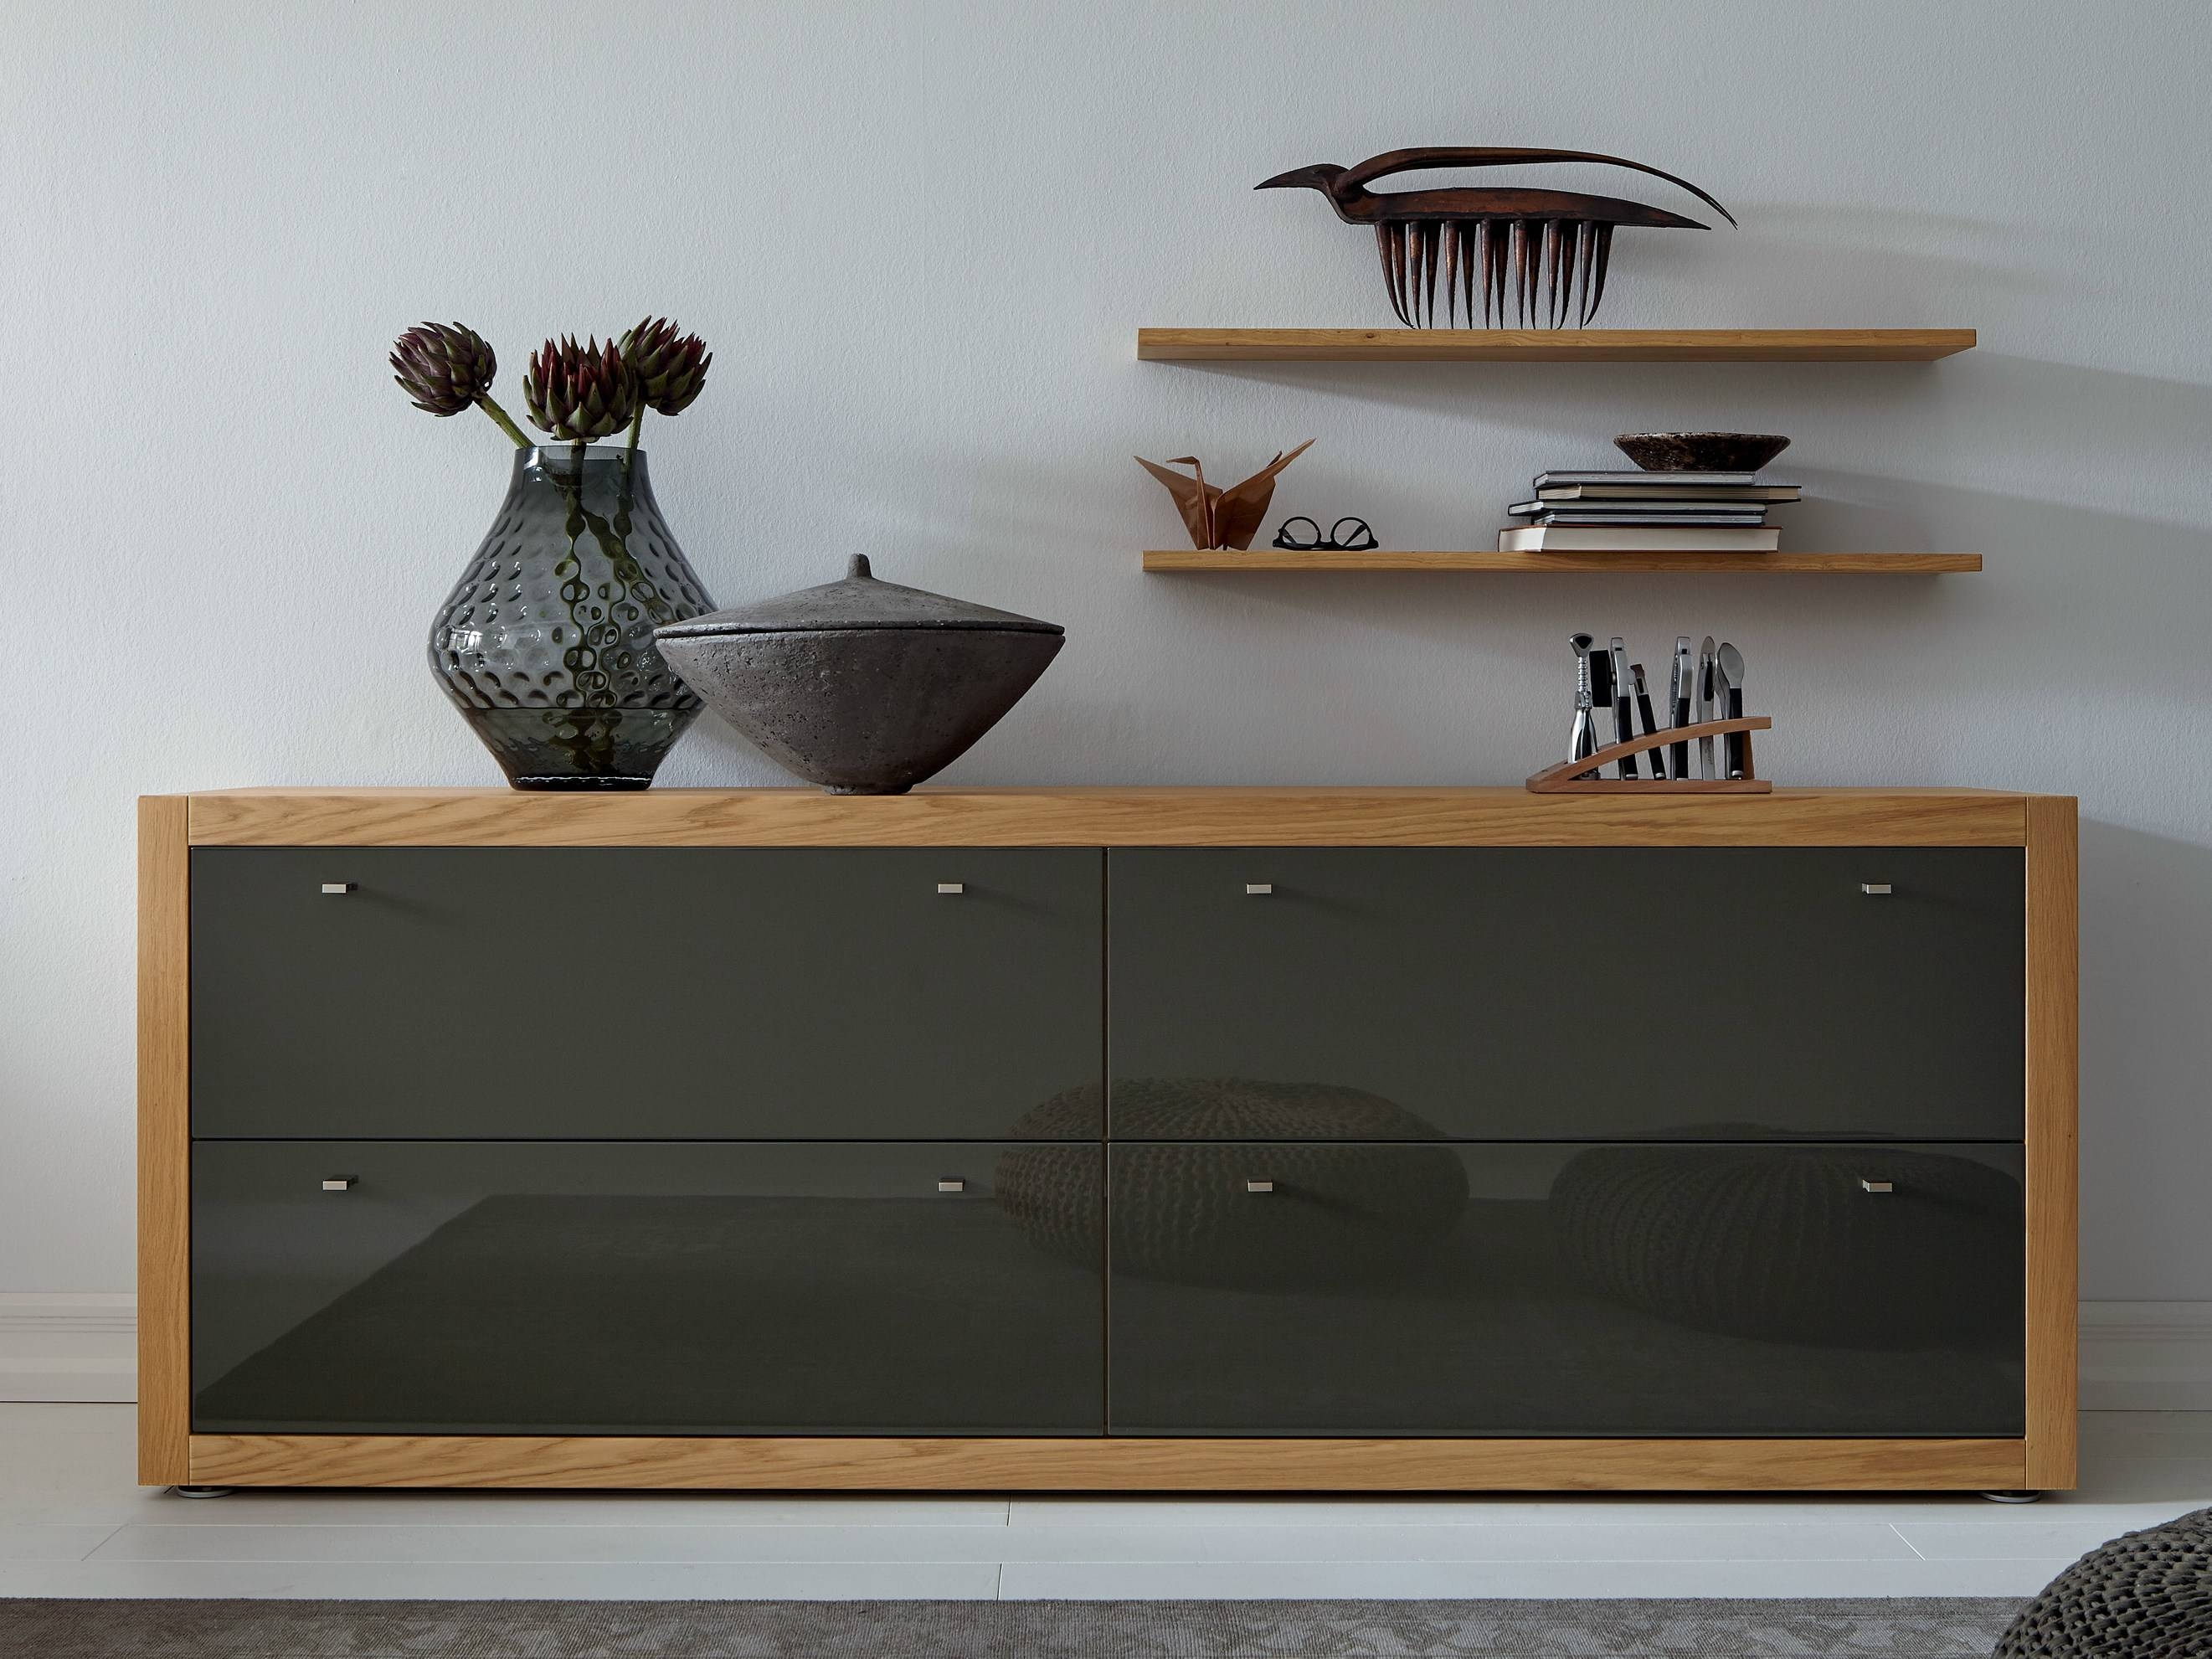 Cool Grey Oak Sideboard Design With Unfinished Wood Frames Regarding Unfinished Sideboards (View 14 of 20)